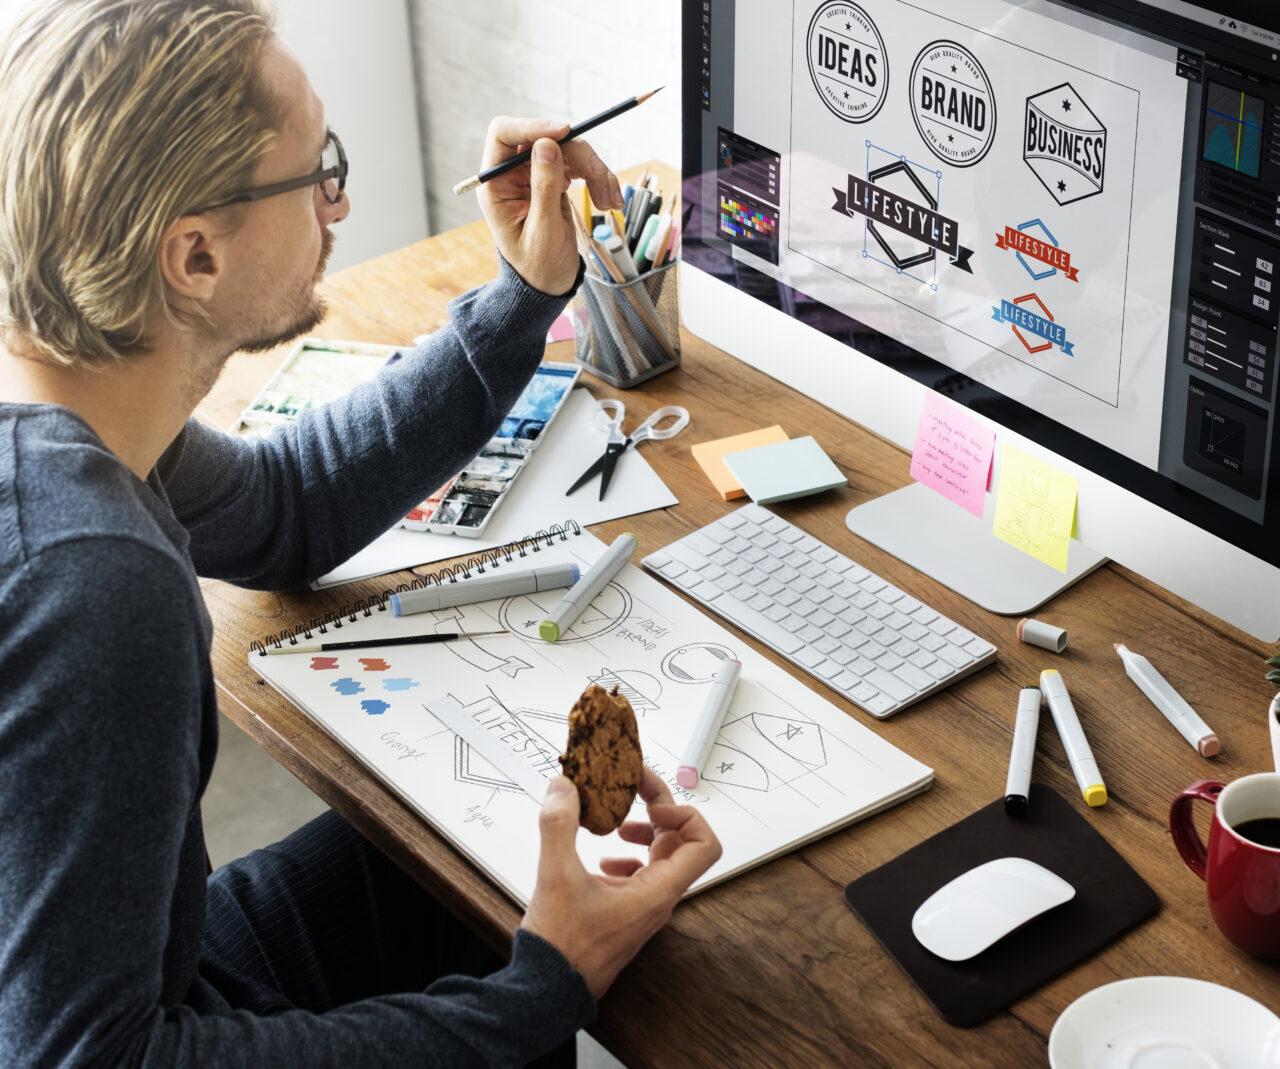 Online Markedsf Ring Med Fokus P S Gemaskineoptimering